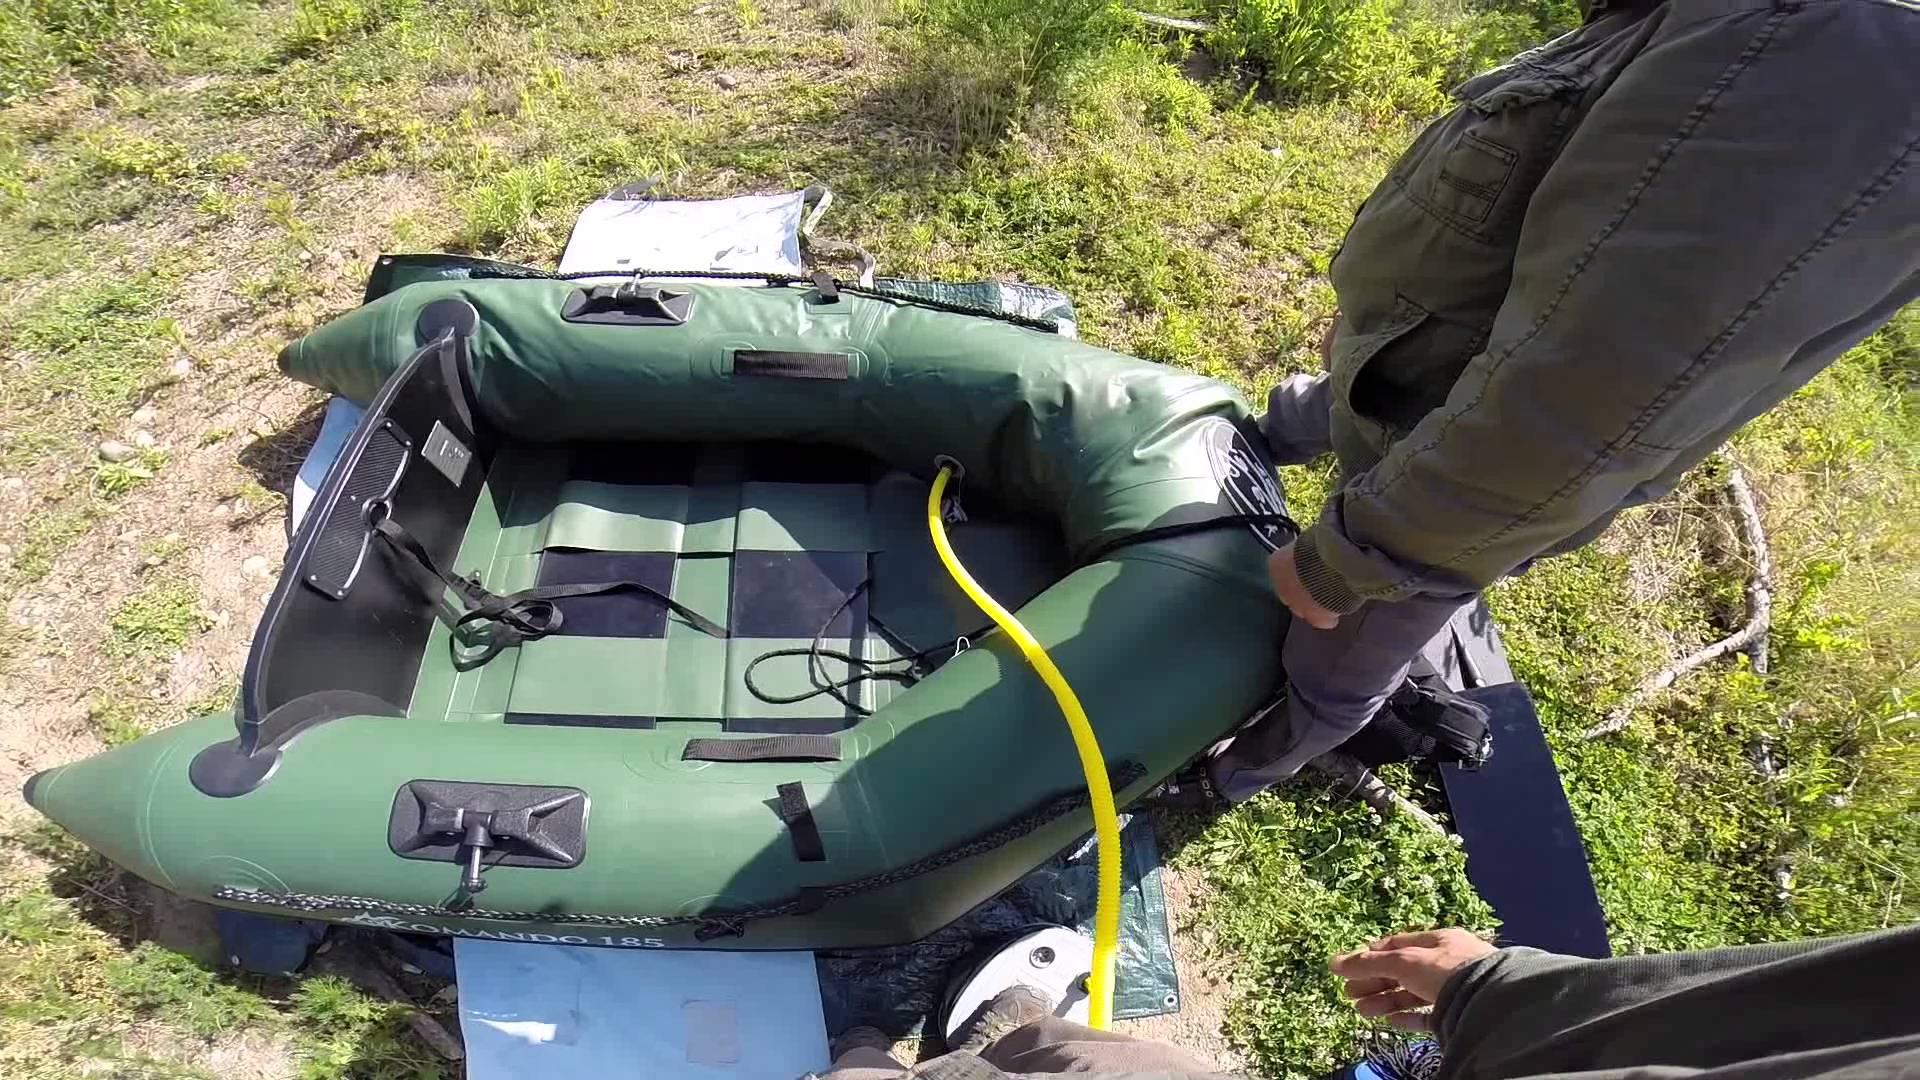 bateau pneumatique navigation frazer komando sr 185 (plancher a lattes)